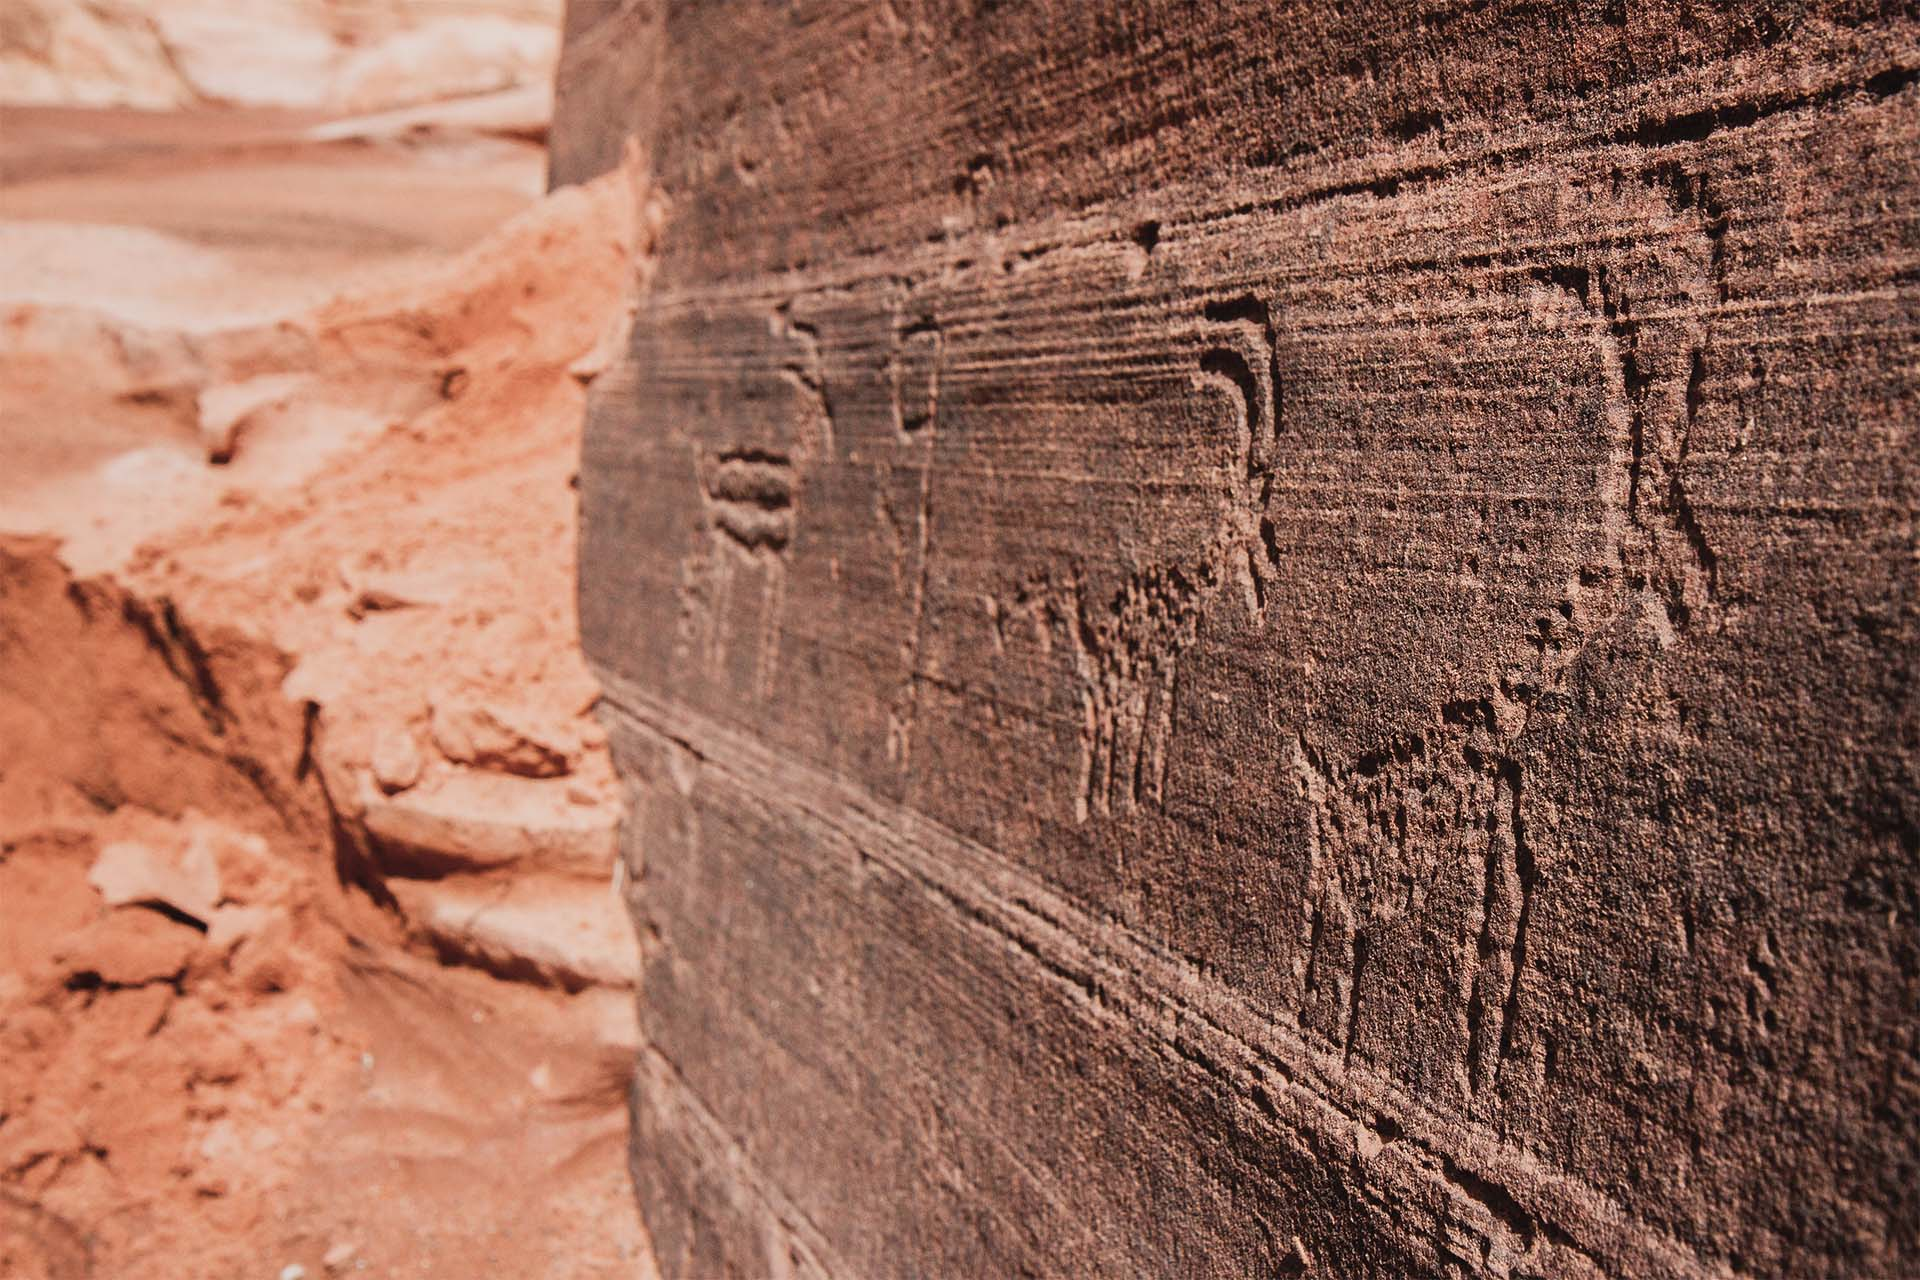 Buckskin Gulch petroglyphs